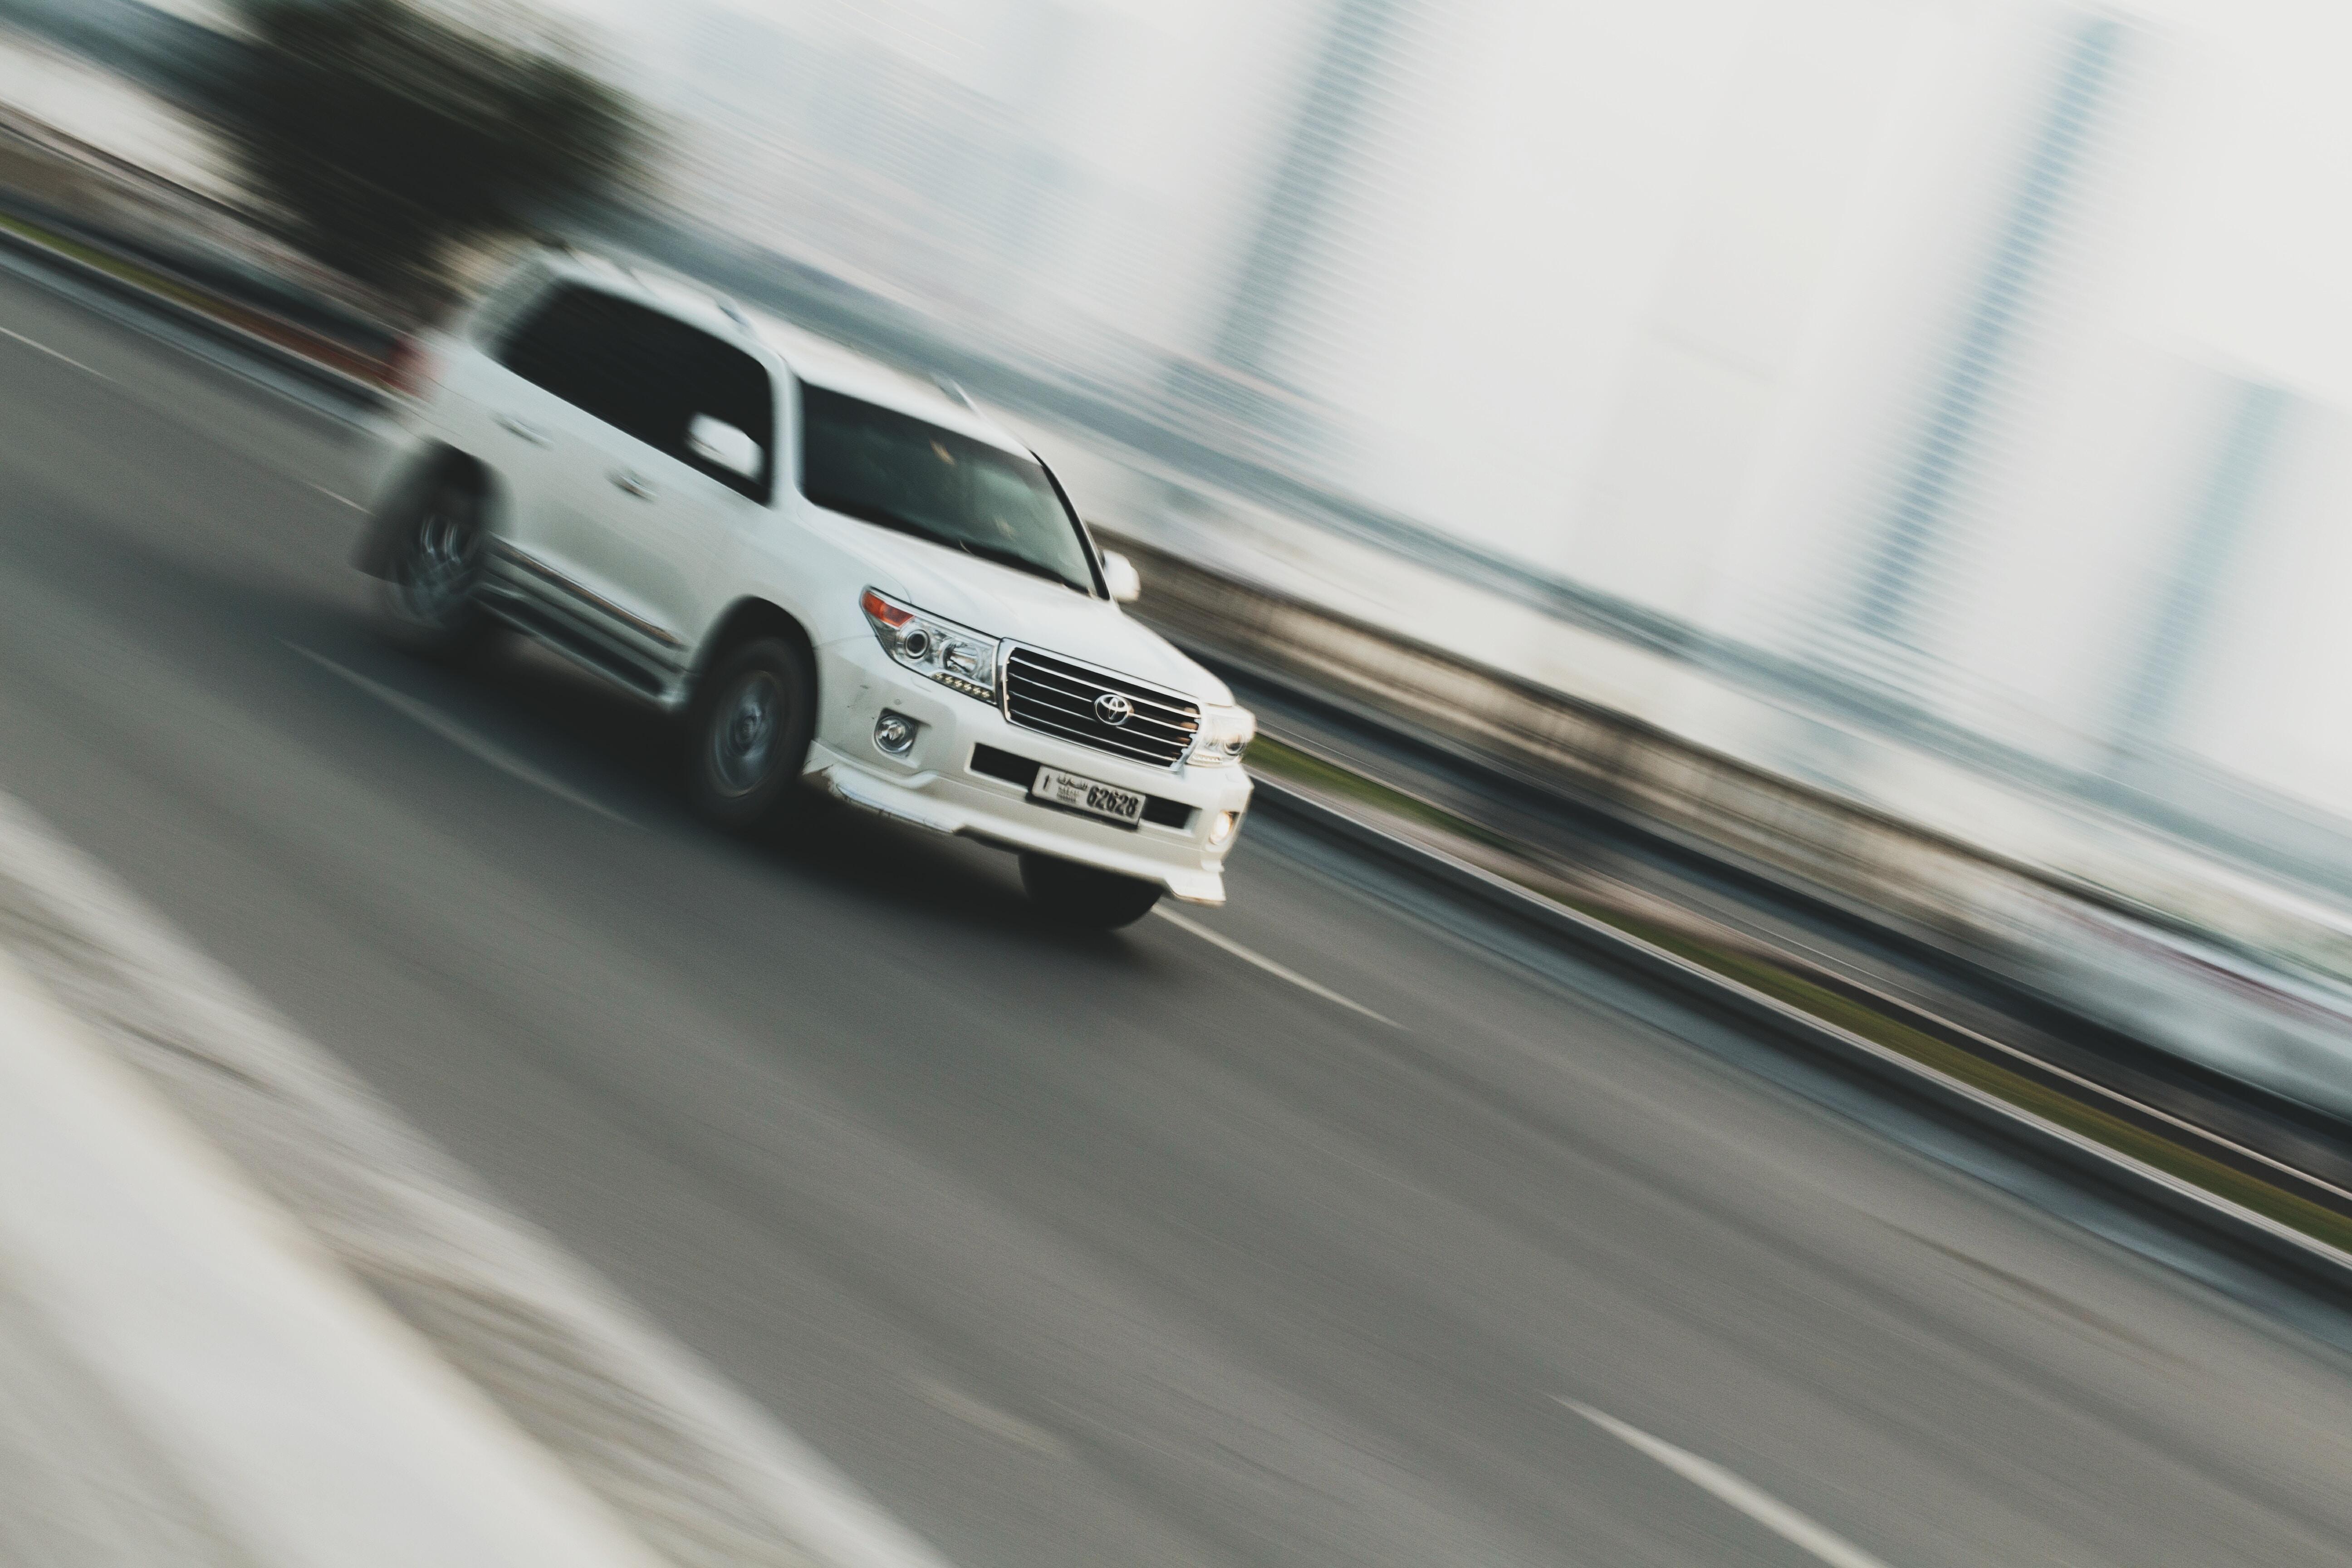 A blurry shot of a white SUV driving on a road in Al Qasba